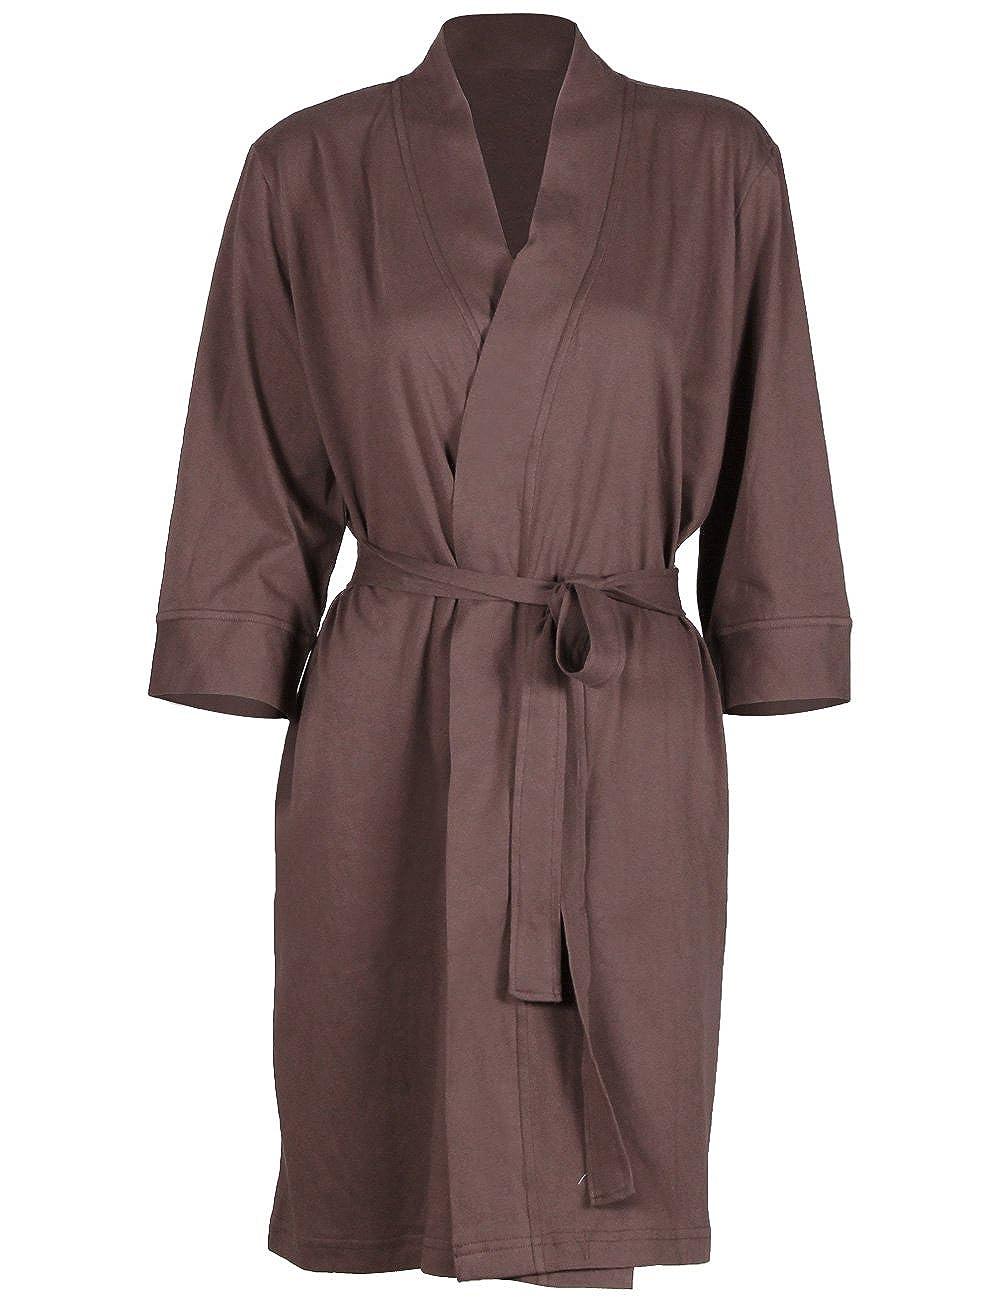 Godsen Women's Plus Size Comfort Cotton Sleepwear Bathrobe Coffee) GB11074c